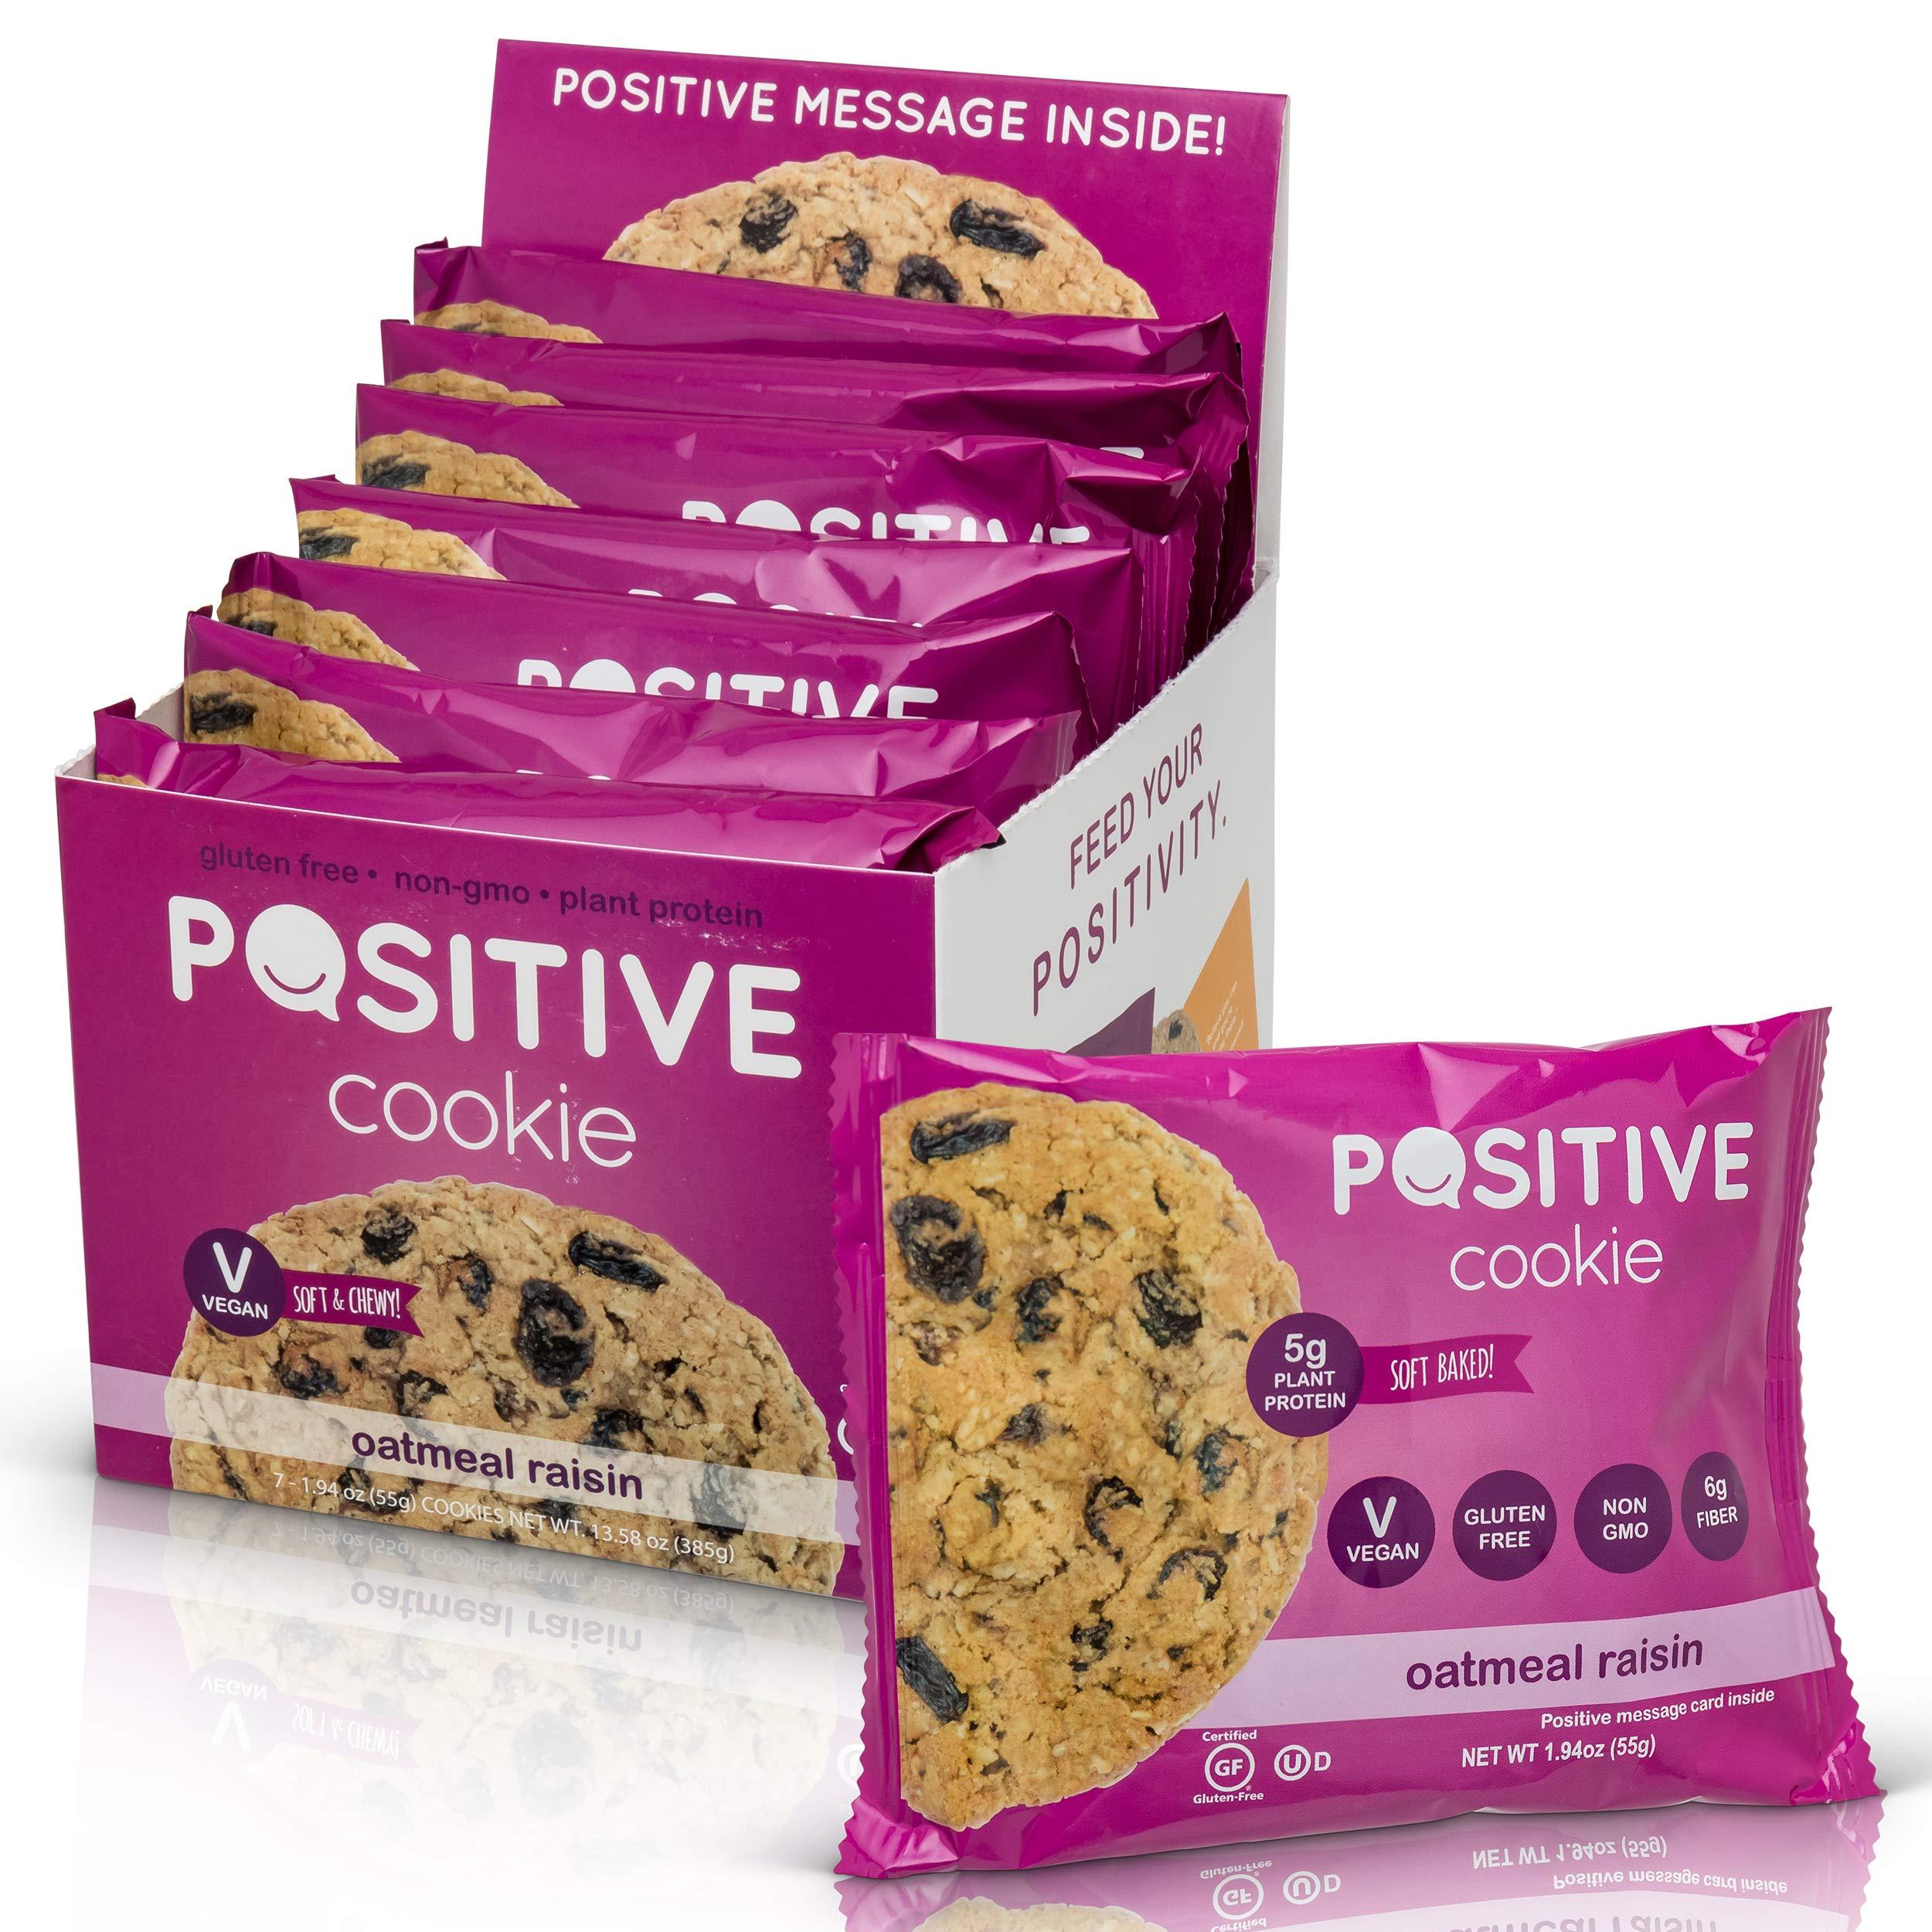 Oatmeal Raisin Gluten Free Kosher Vegan Protein Cookies (7 Cookies) by Positive Cookie